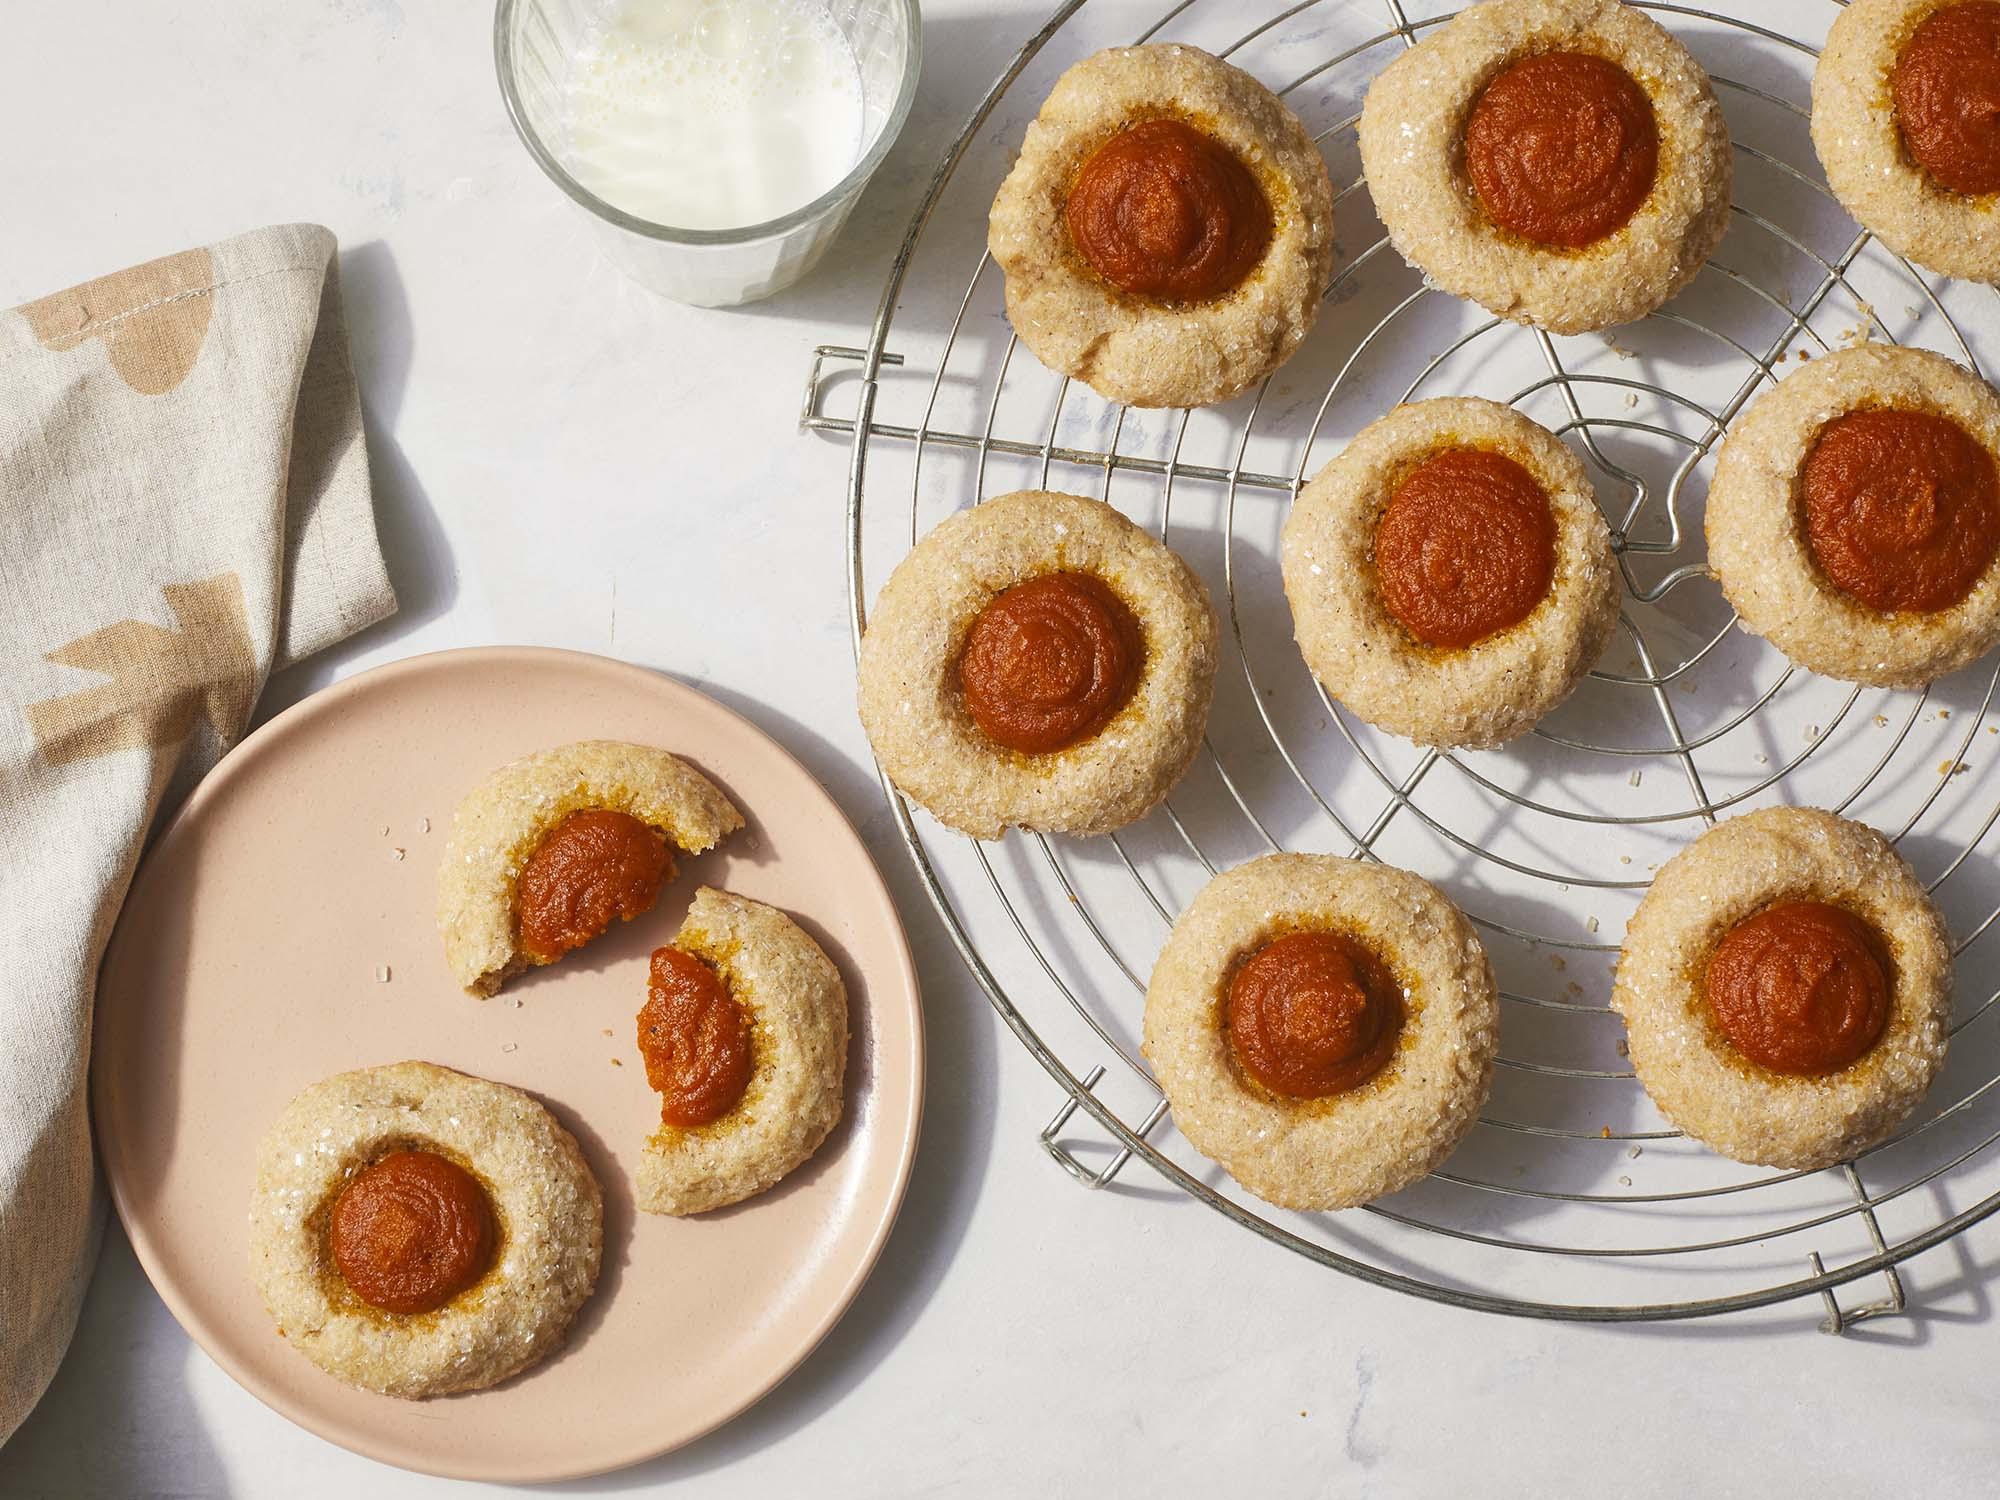 mr - Pumpkin Pie Cookies Image